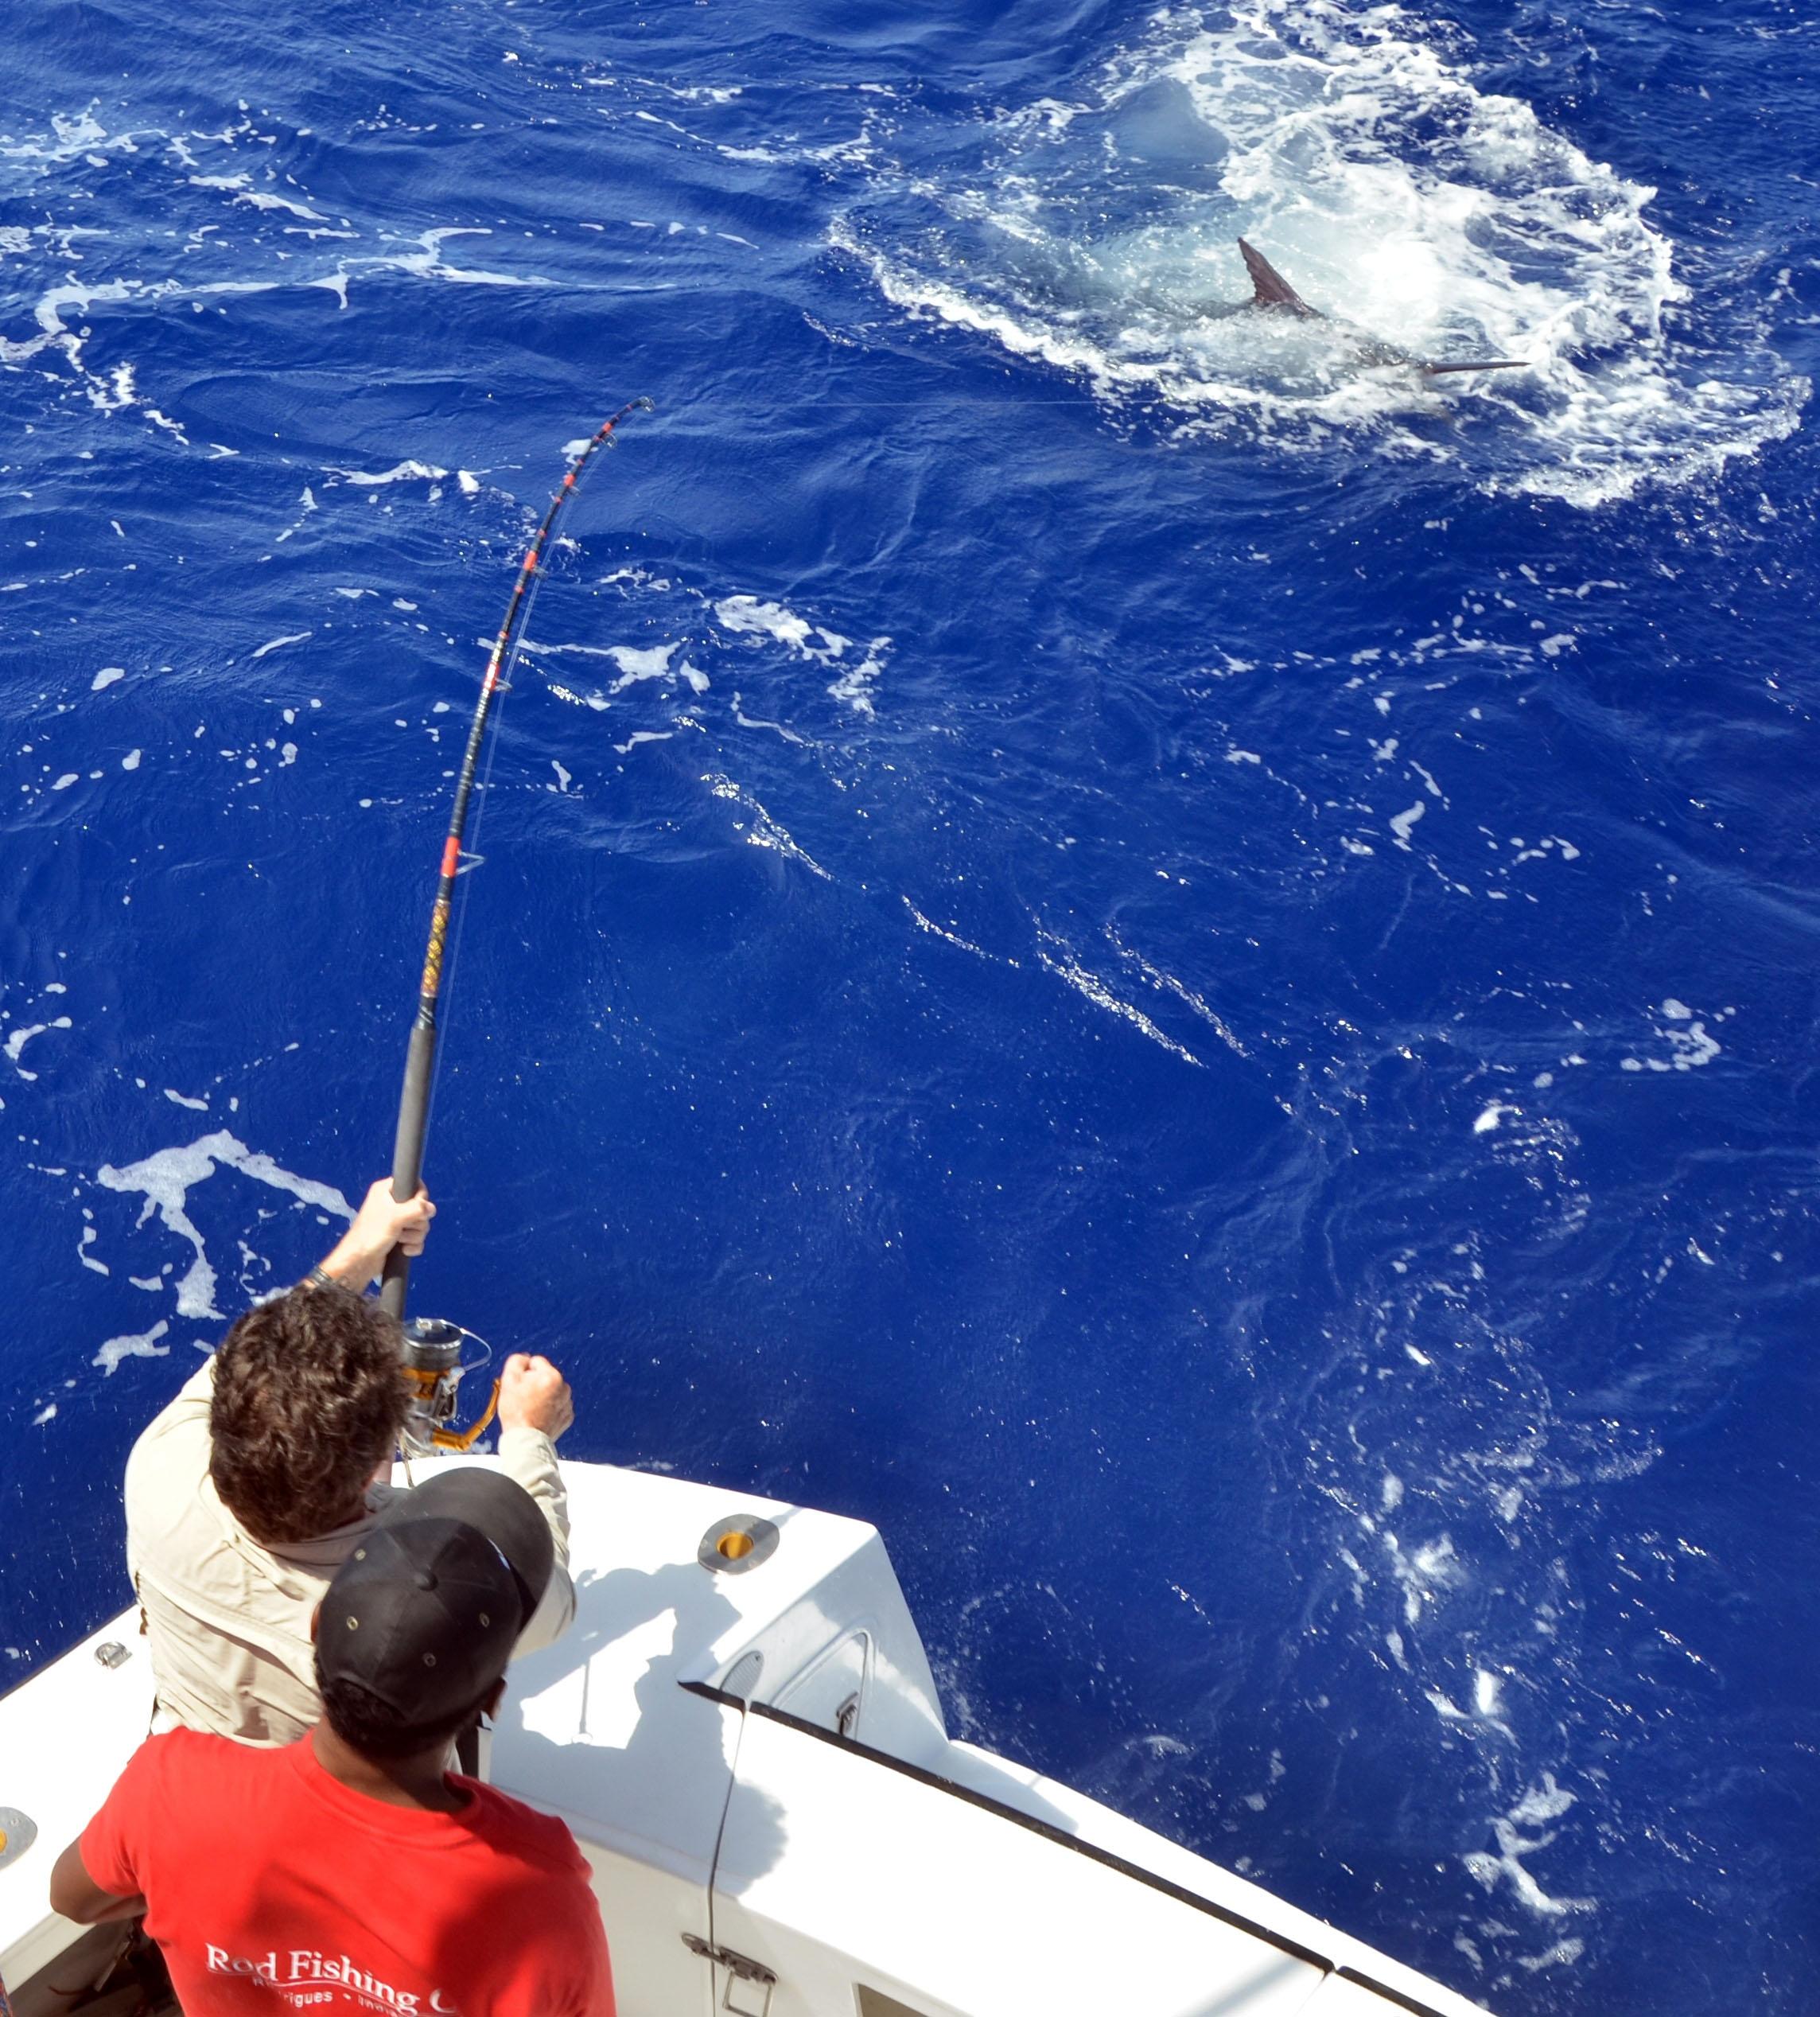 Marlin au bateau en Heavy Spinning par Claudius - Déc 2012 - Rod Fishing Club - Ile Rodrigues - Maurice - Océan Indien